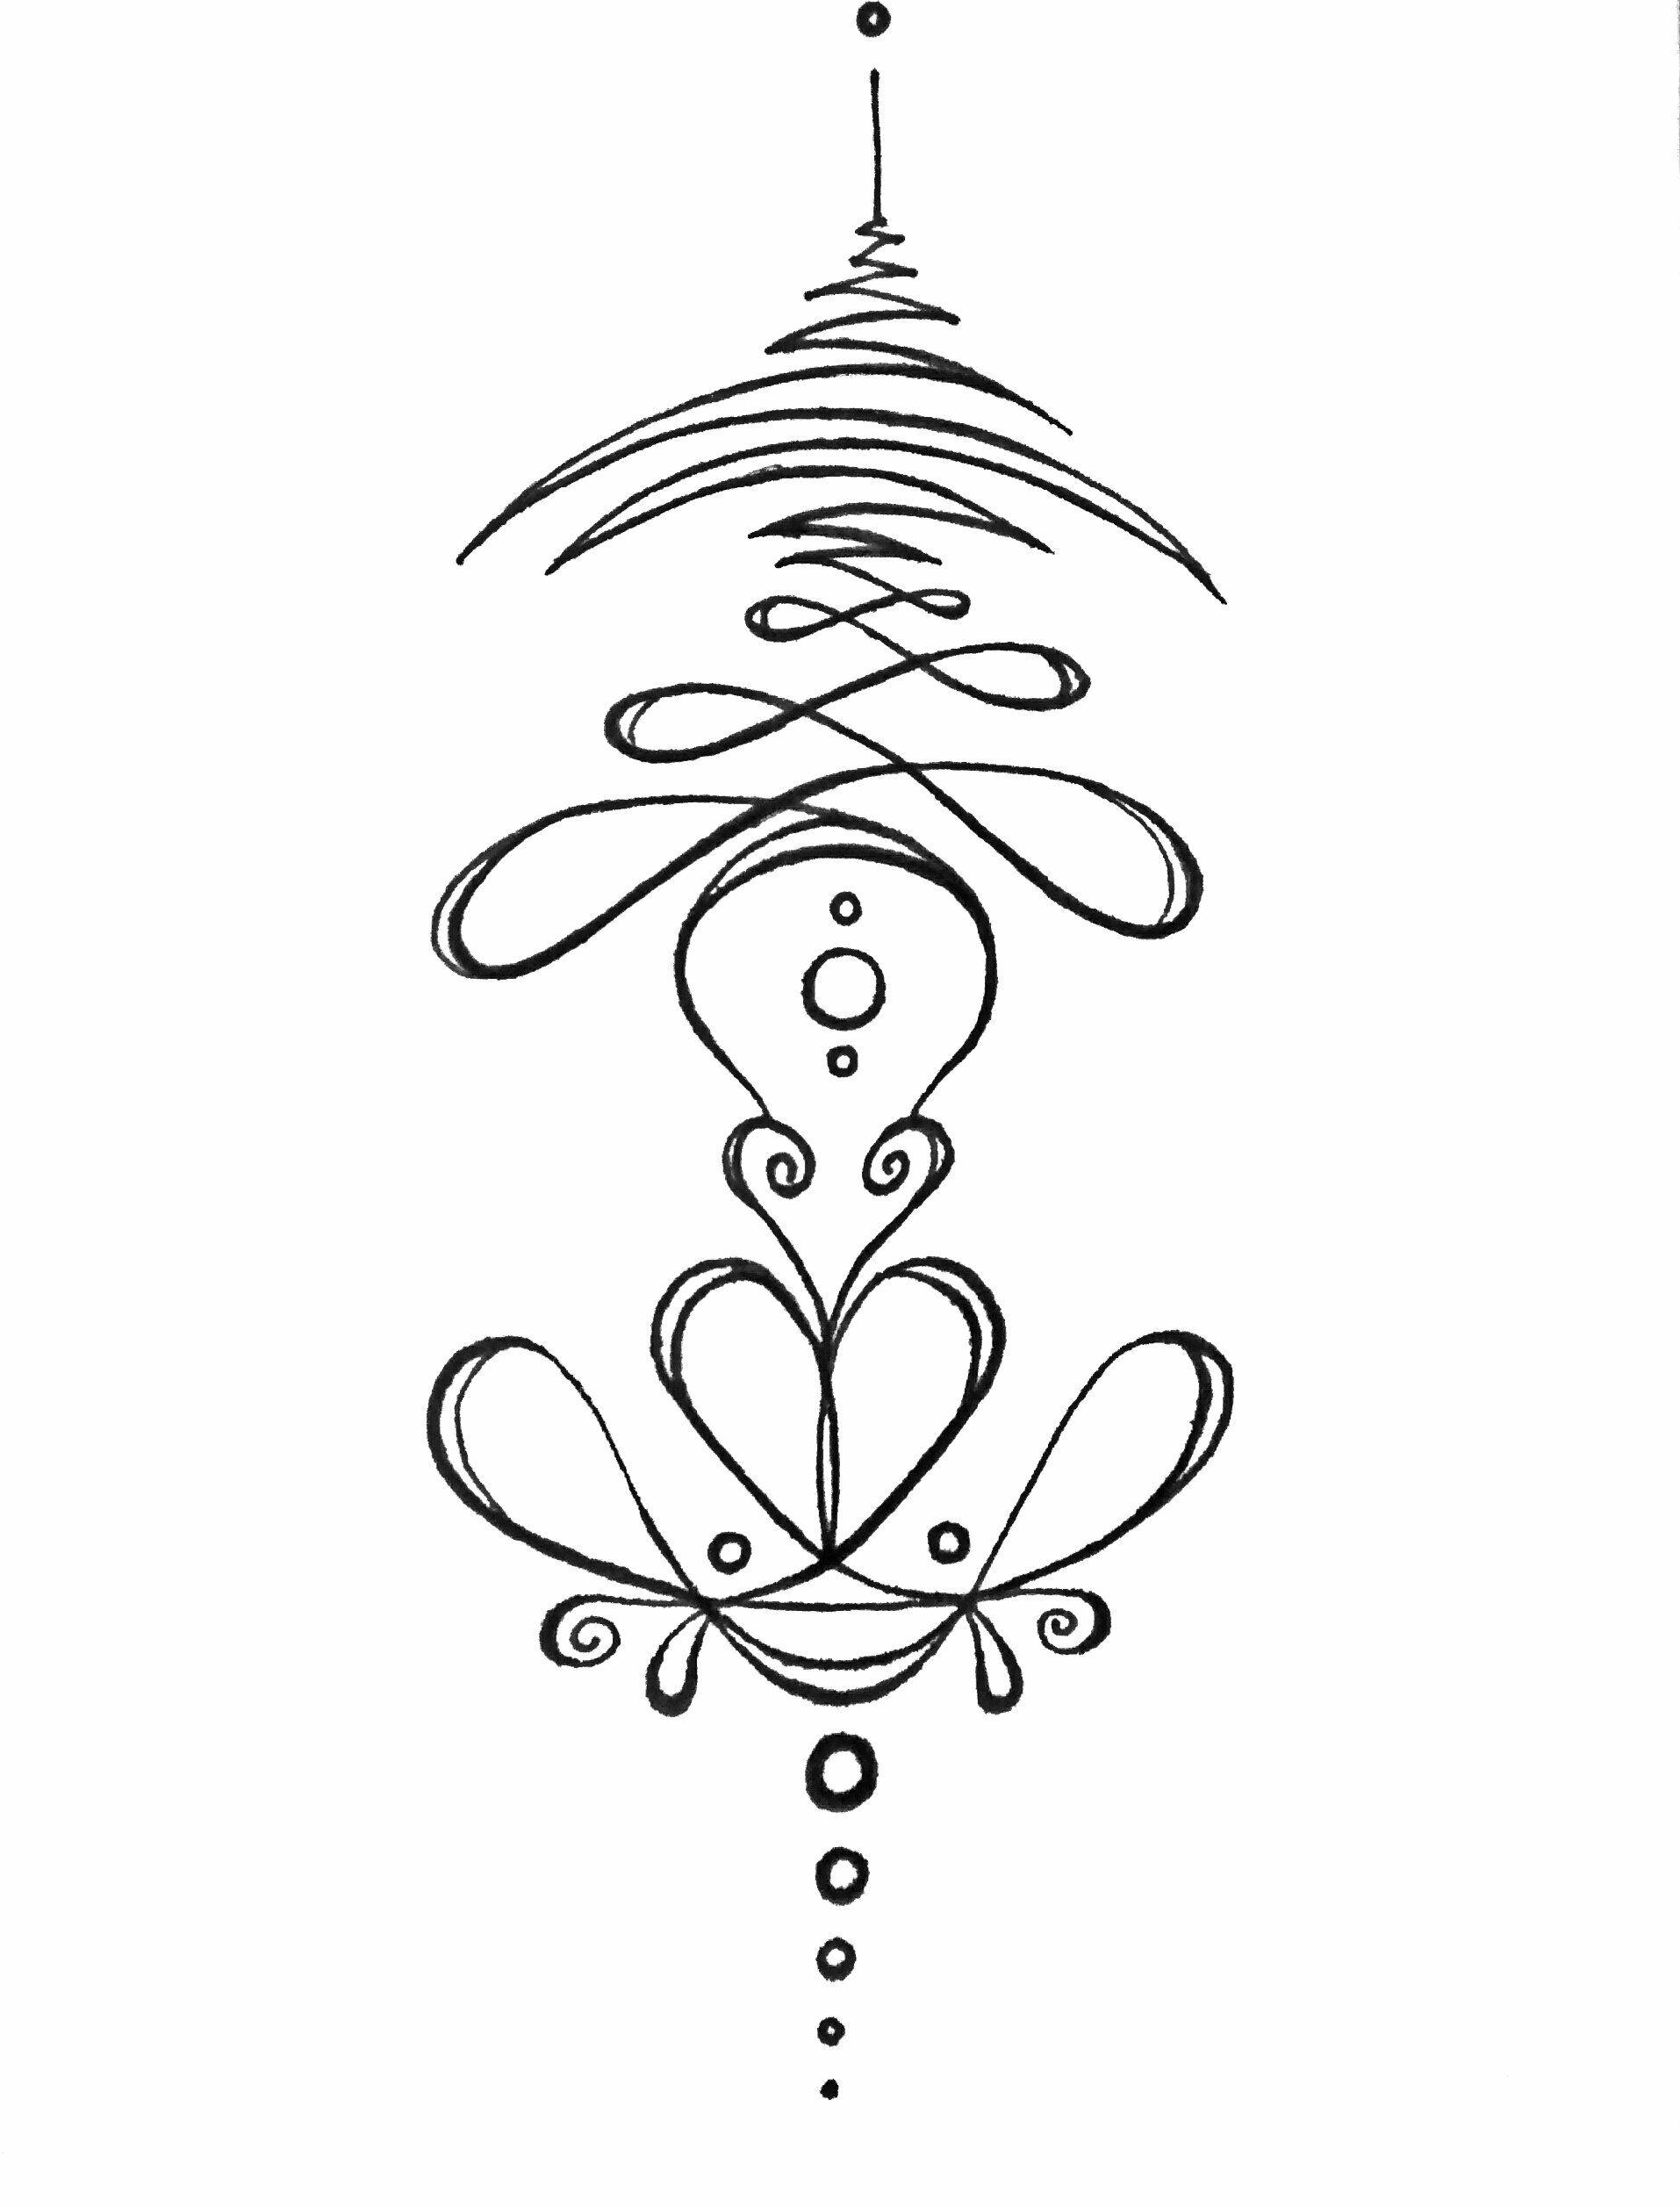 unalome designs Google Search Unalome, Unalome tattoo